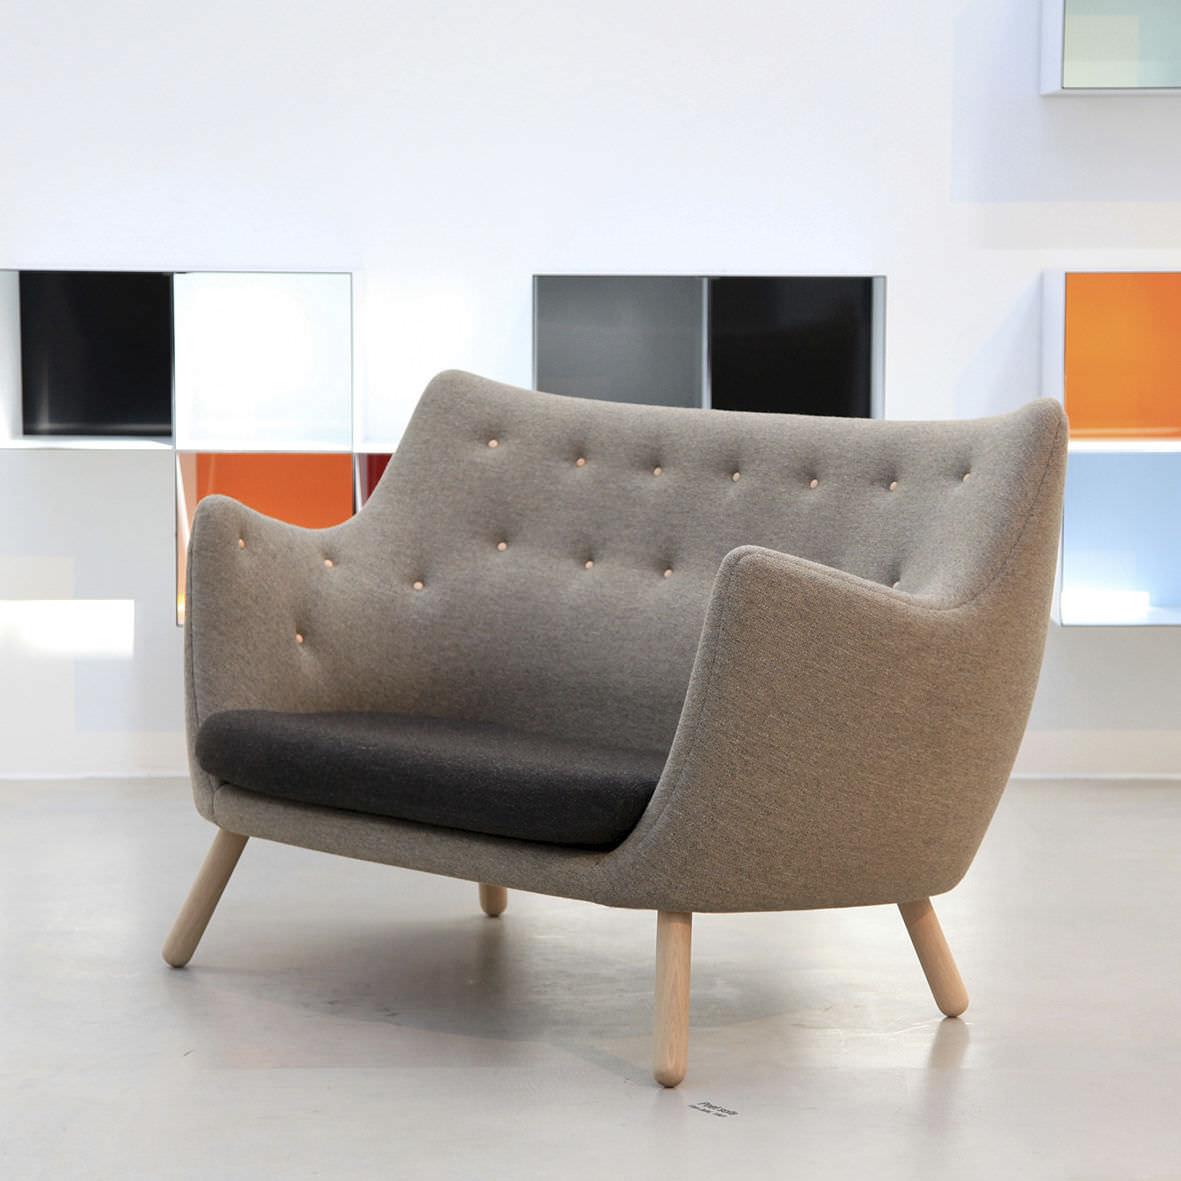 Sofa / Skandinavisches Design / Holz / Stoff / von Finn Juhl - POET ...